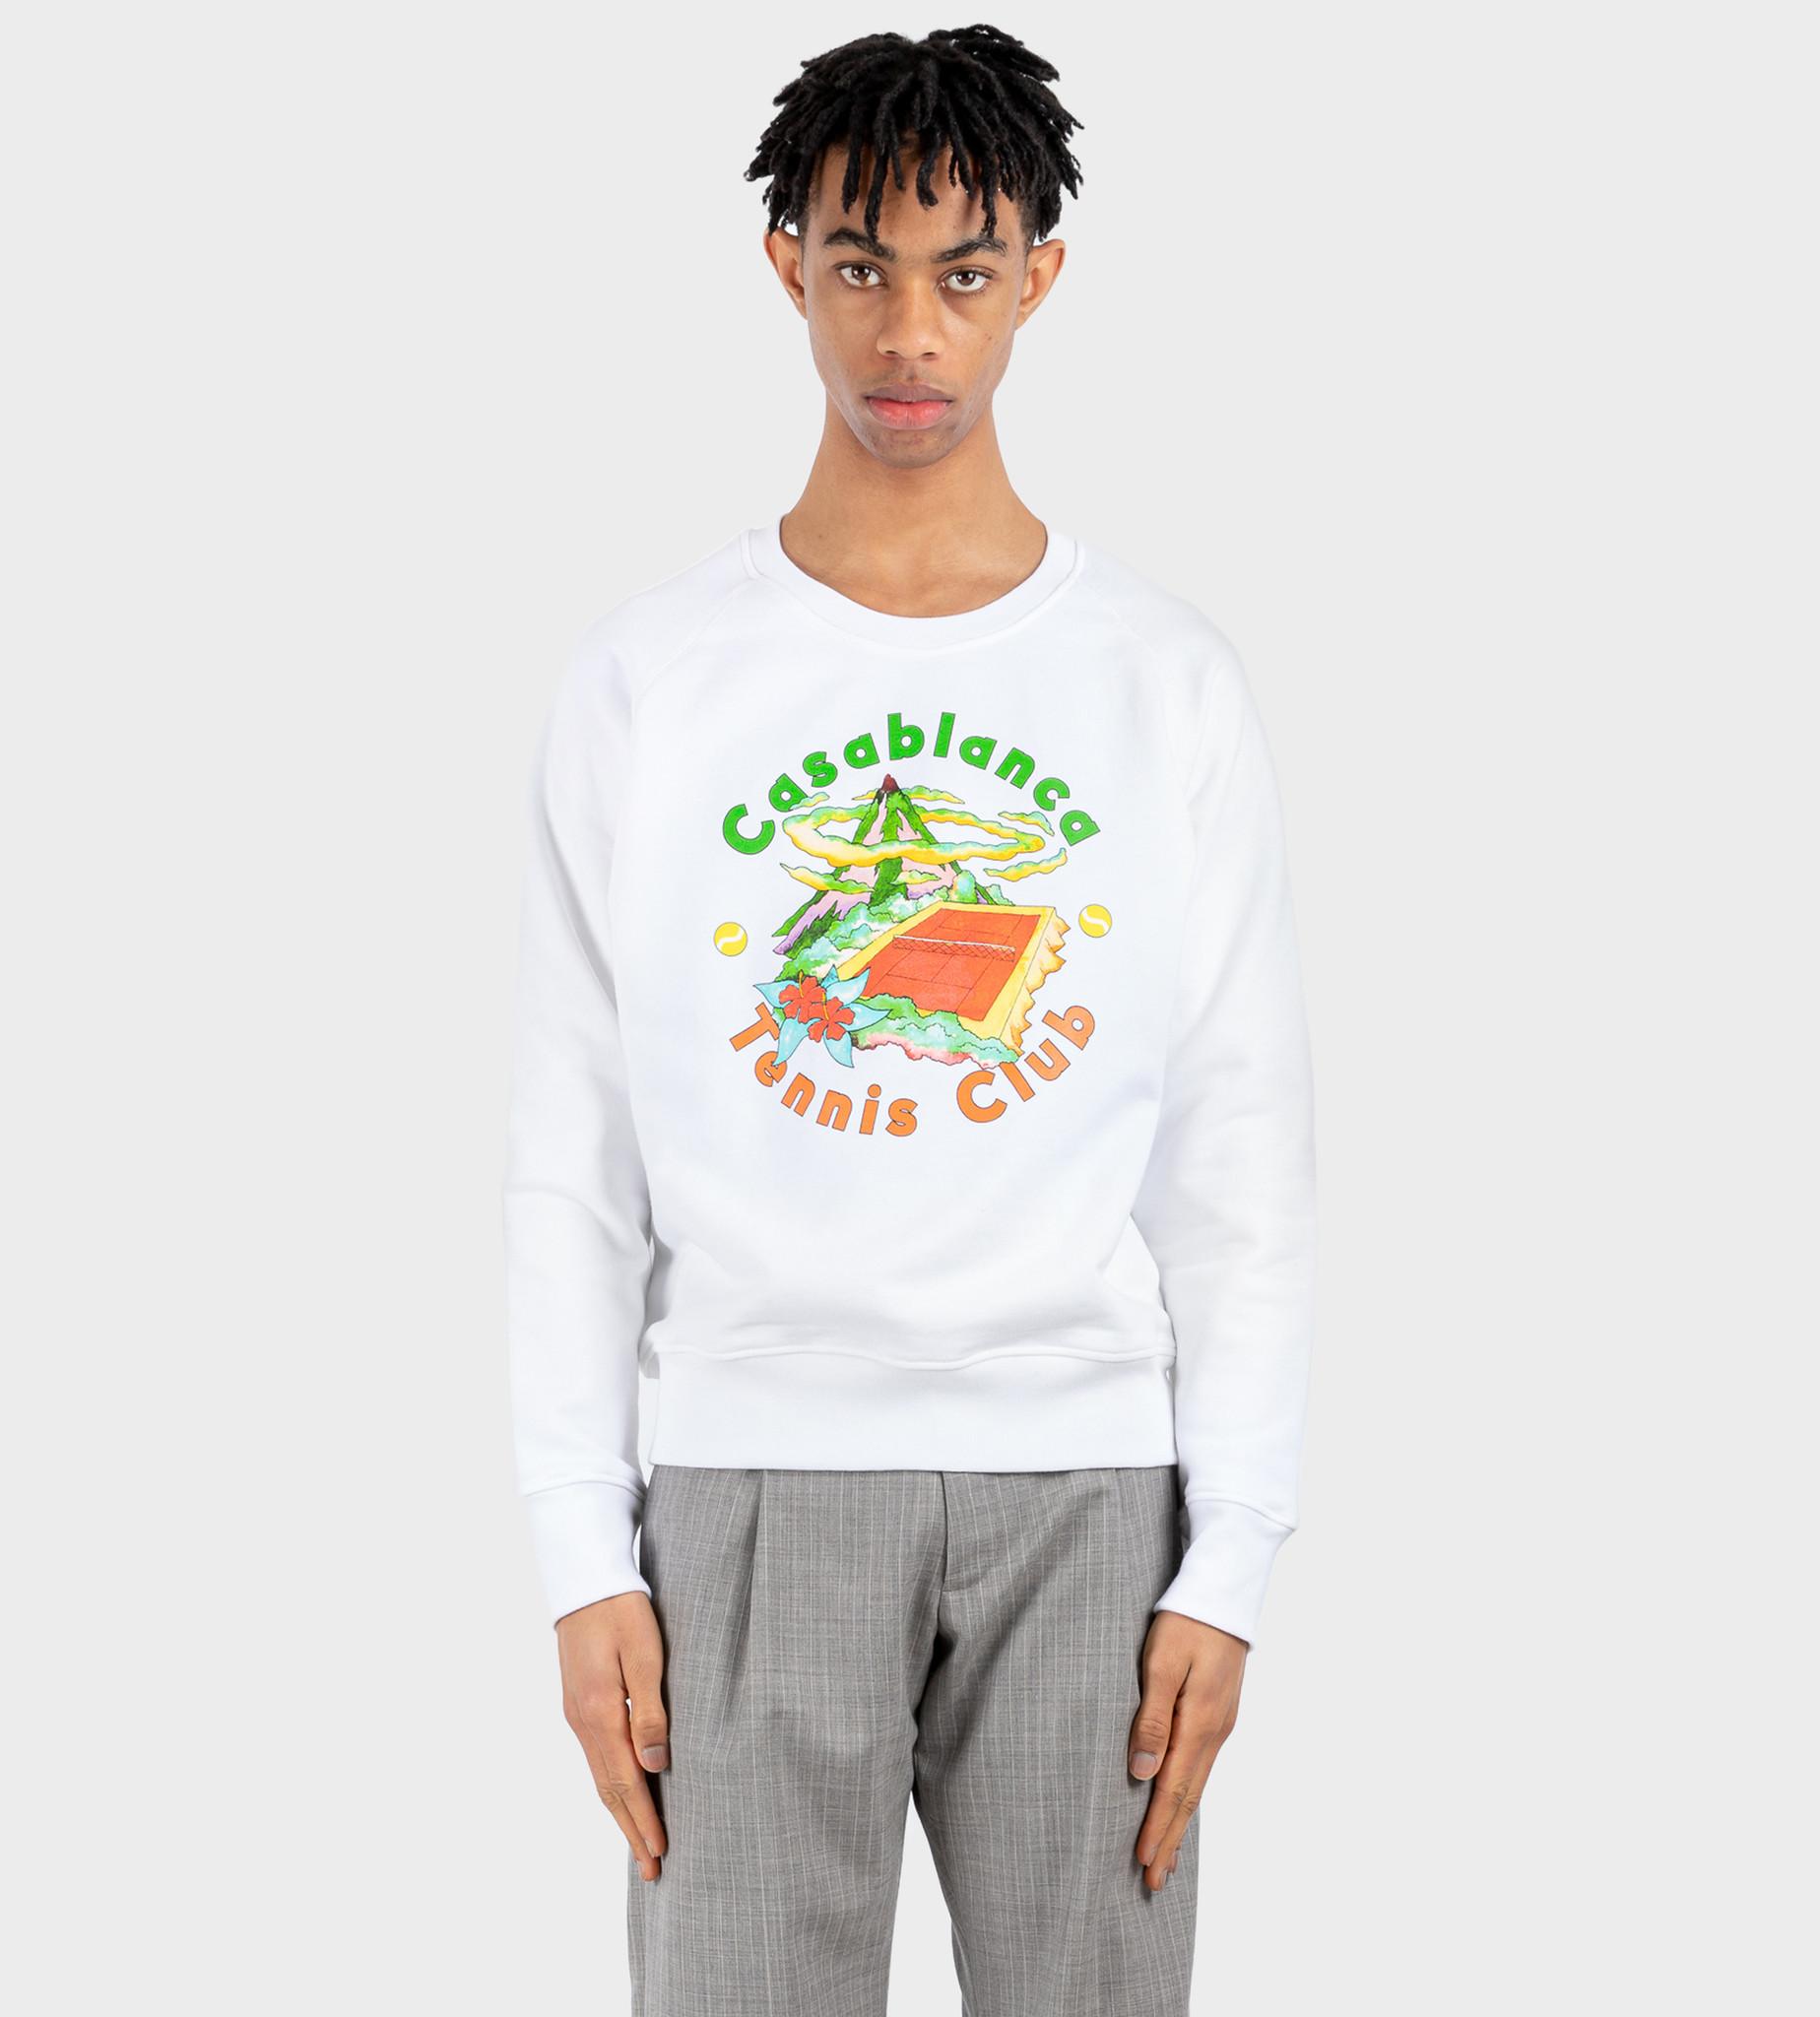 CASABLANCA Tennis Club Island Sweatshirt White